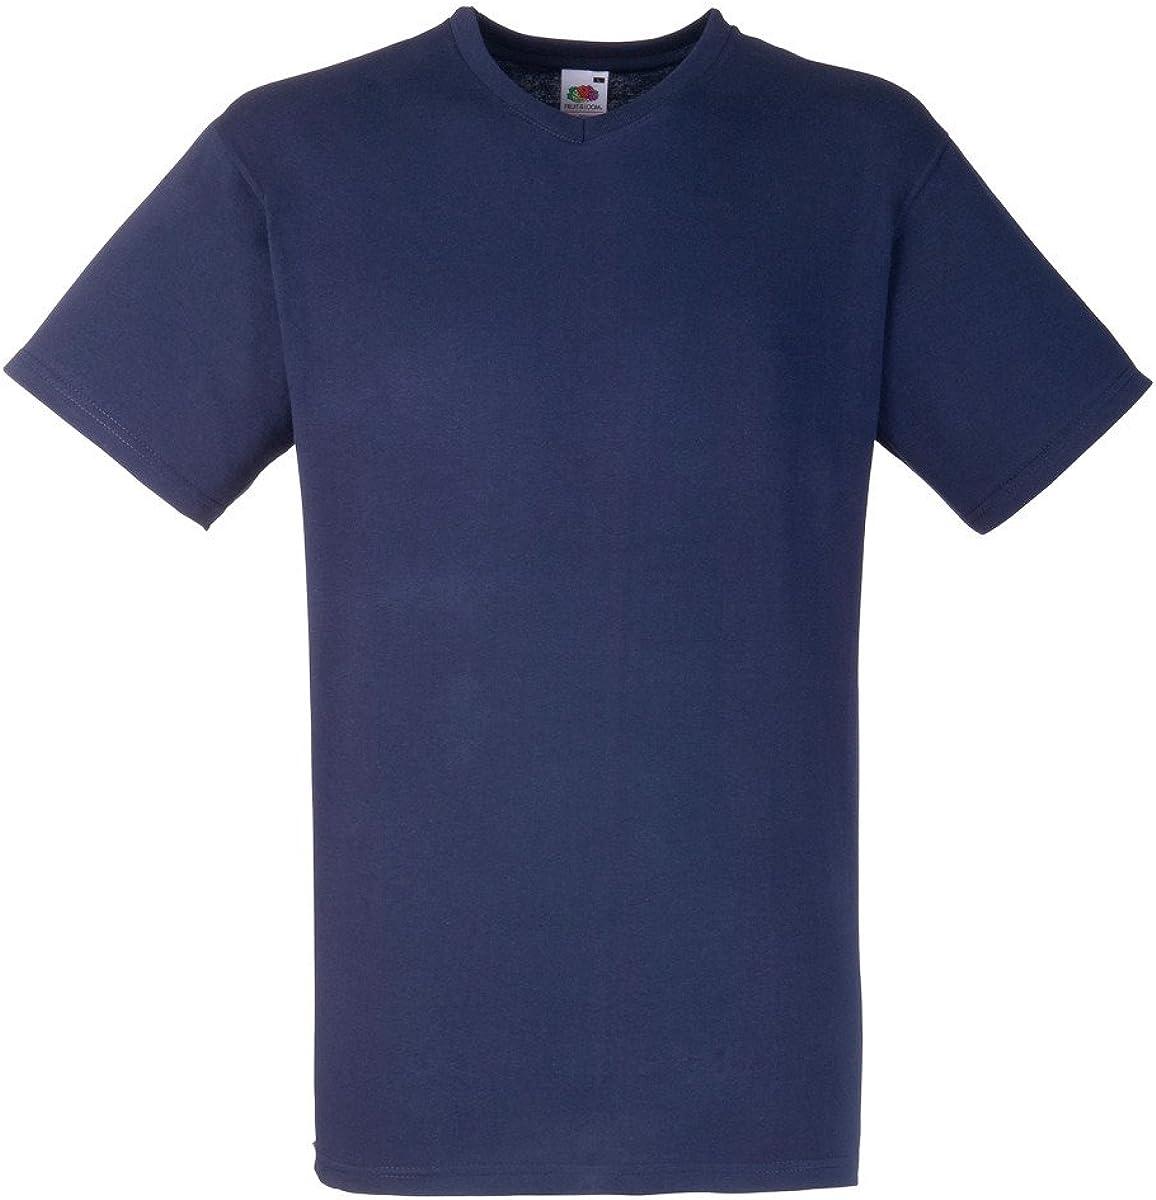 Fruit of the Loom Men's V Neck Value Short Sleeve T Shirt Deep Navy